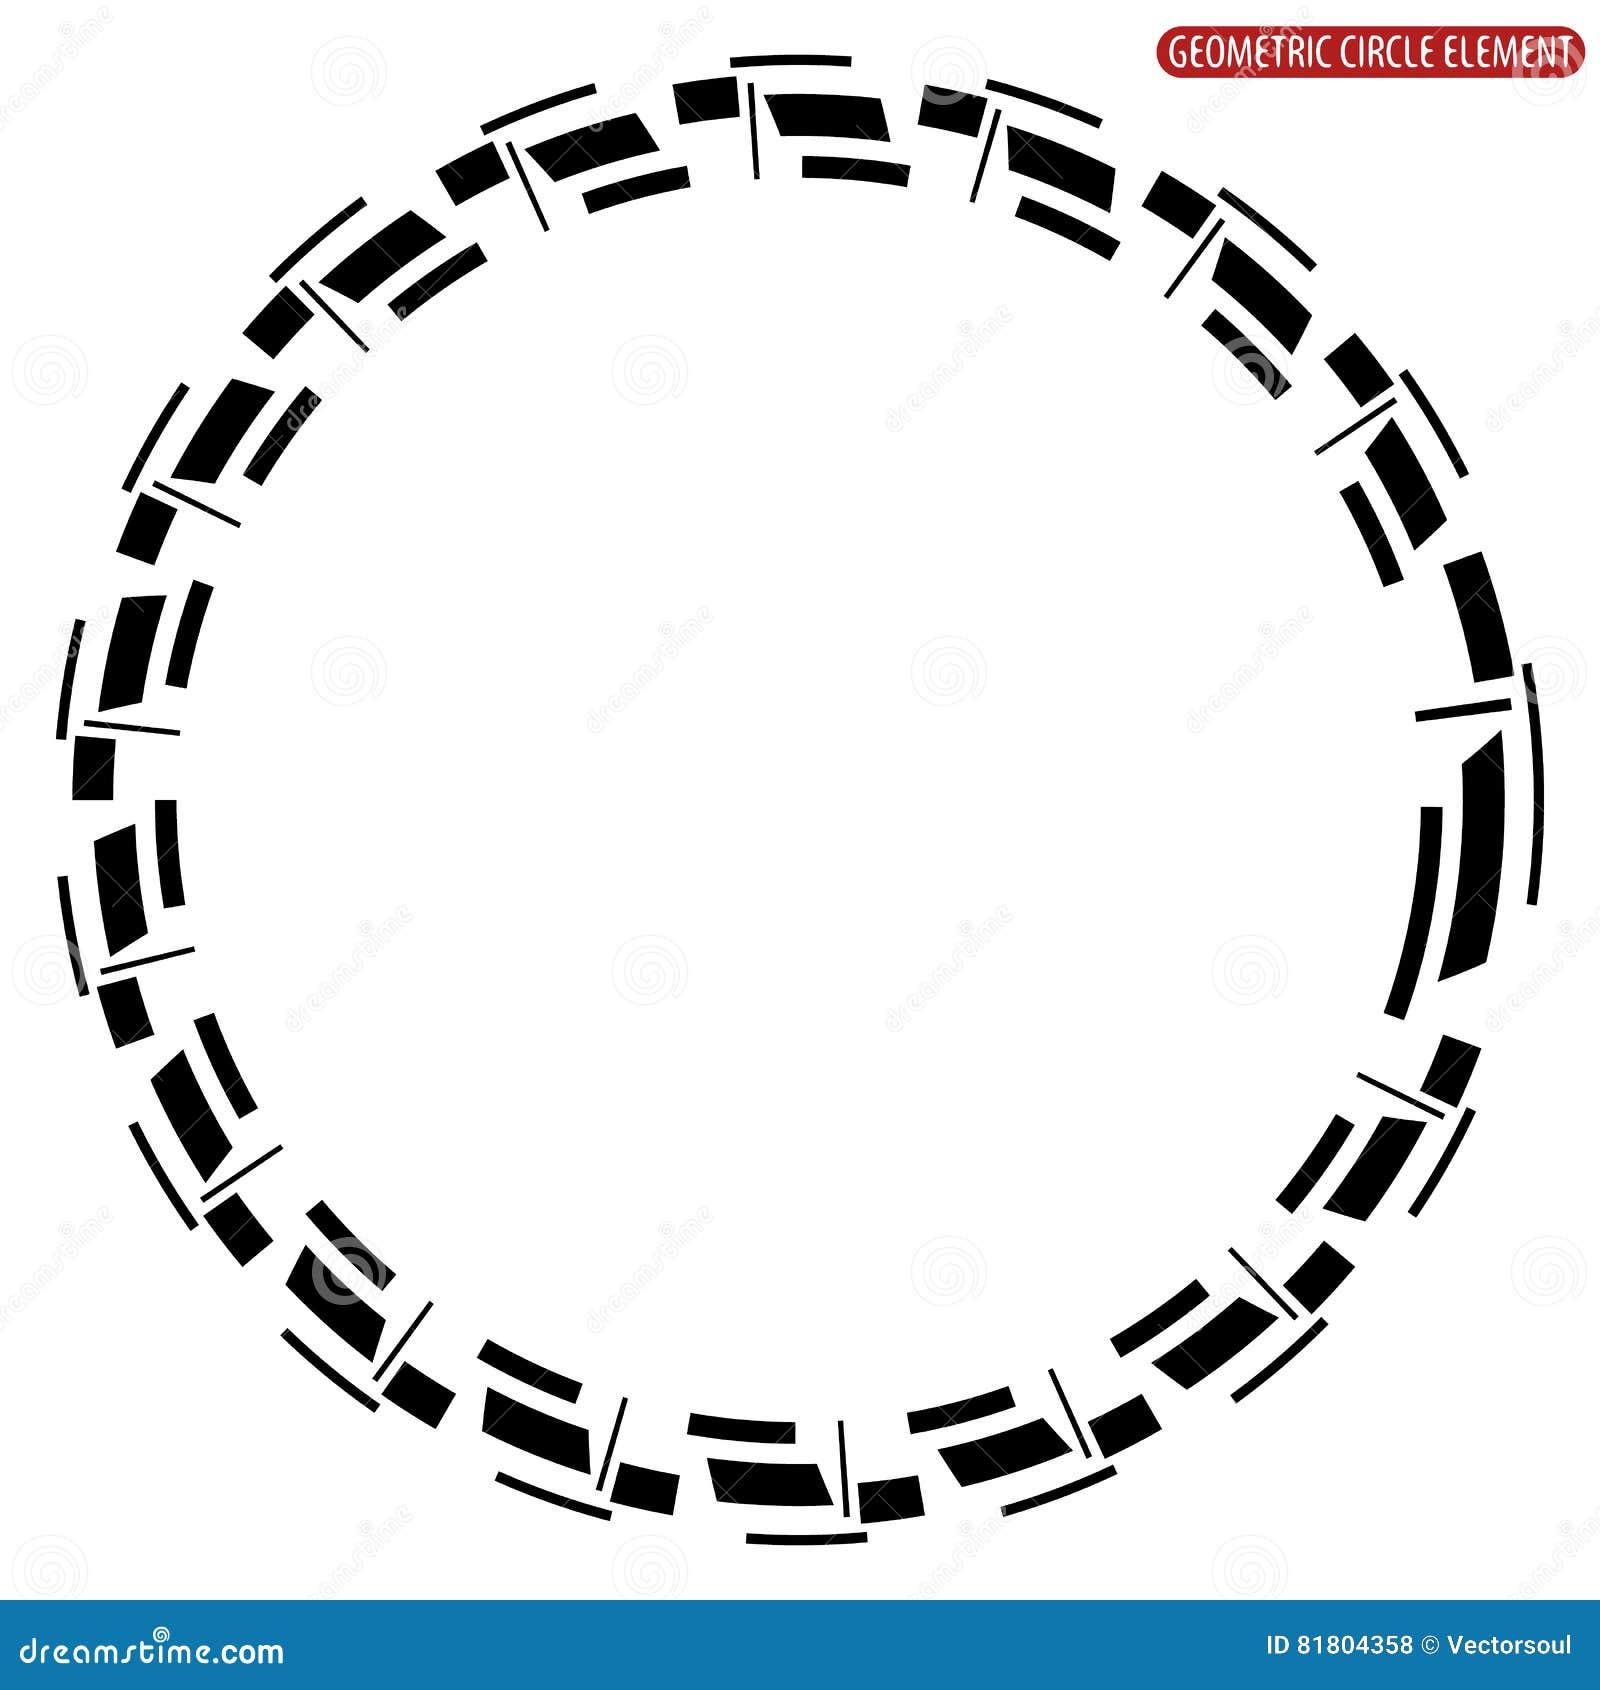 Геометрический элемент круга Абстрактная monochrome форма круга